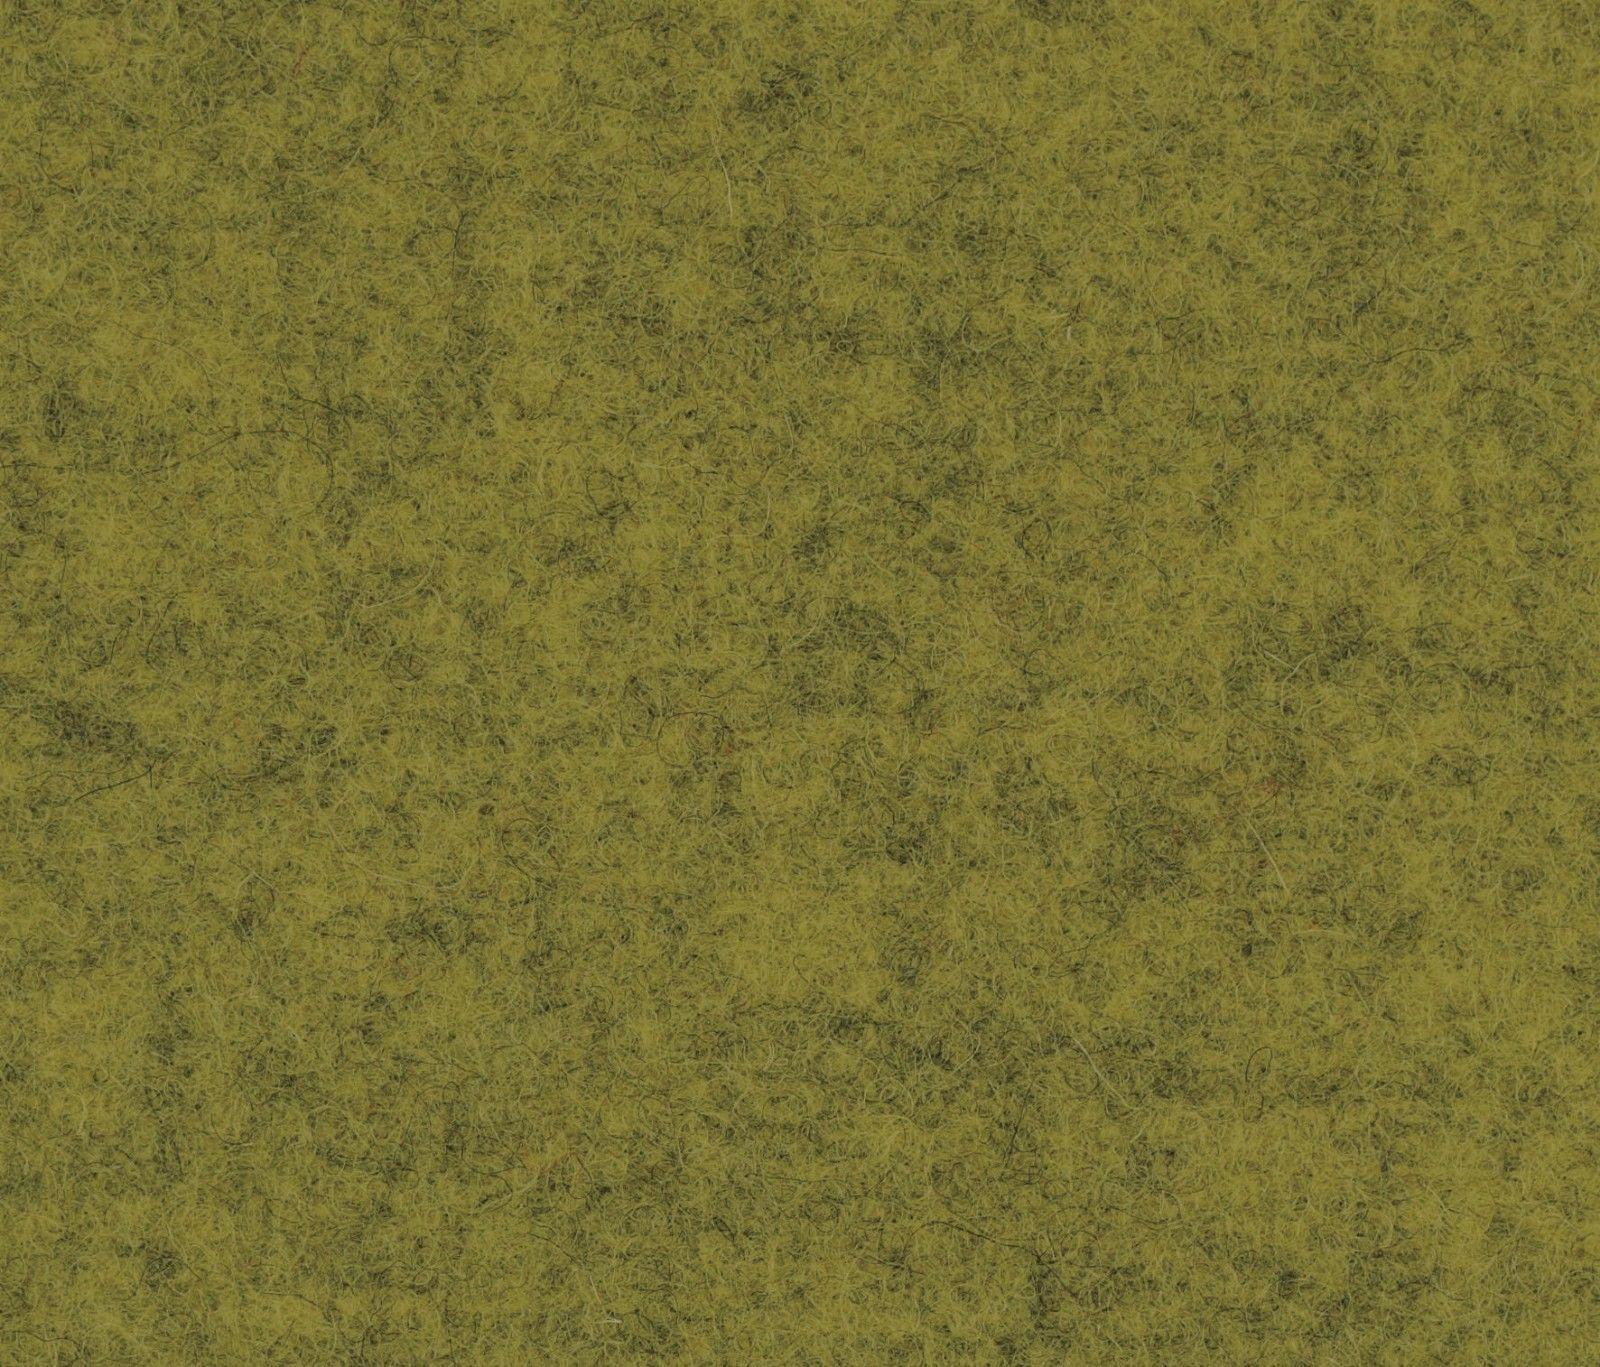 1.75 yards Camira Upholstery Fabric Blazer MCM Wool Camphill Green CUZ1K J